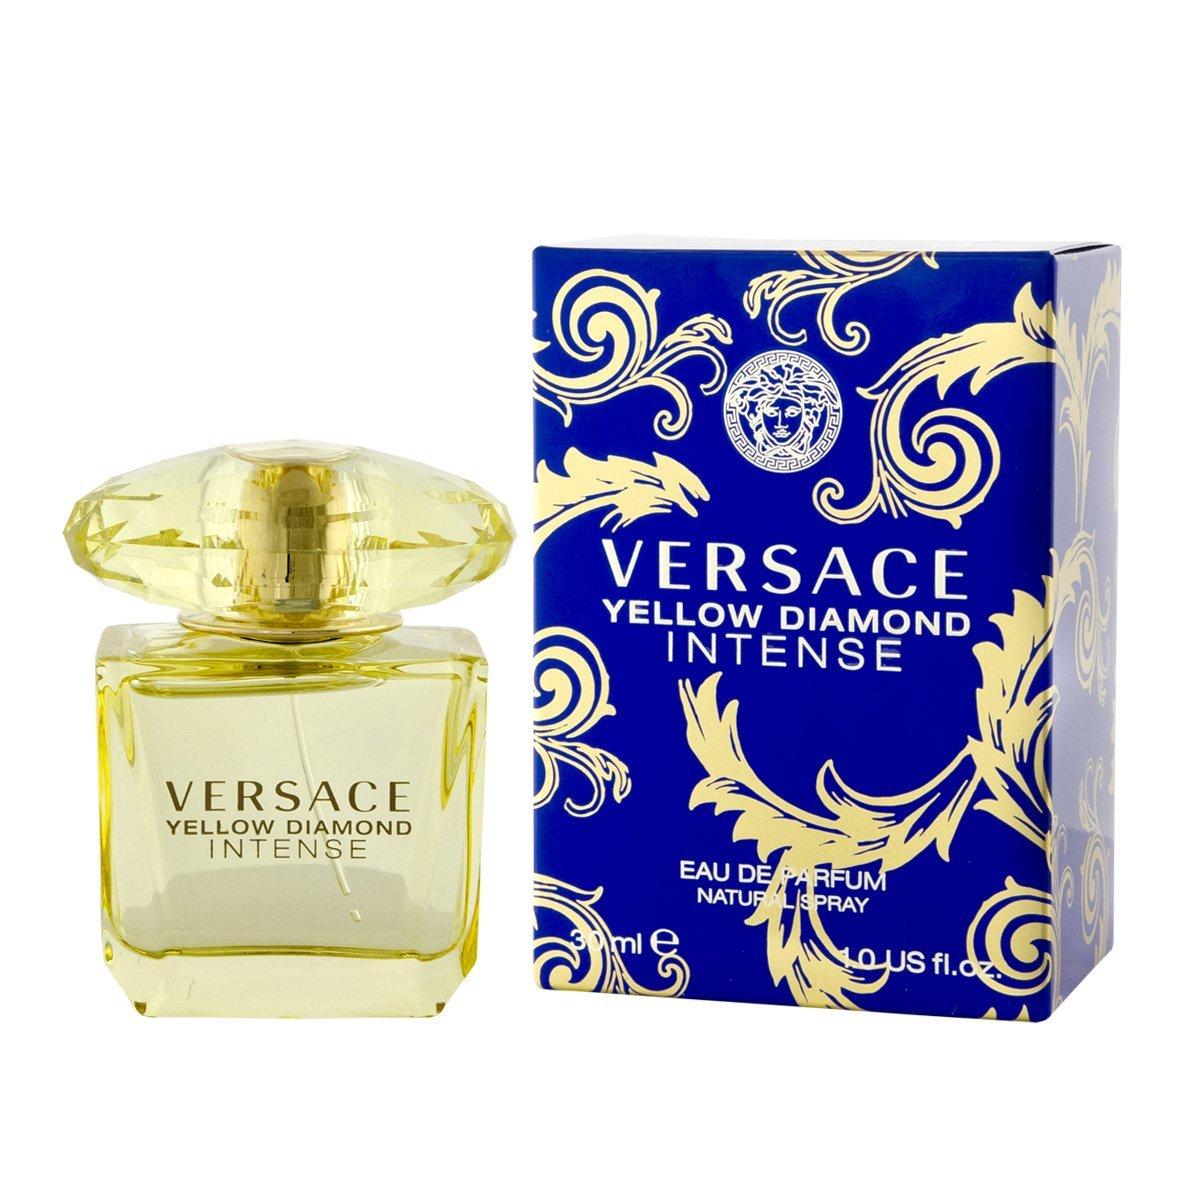 versace yellow diamond perfume price serafini pizzeria. Black Bedroom Furniture Sets. Home Design Ideas